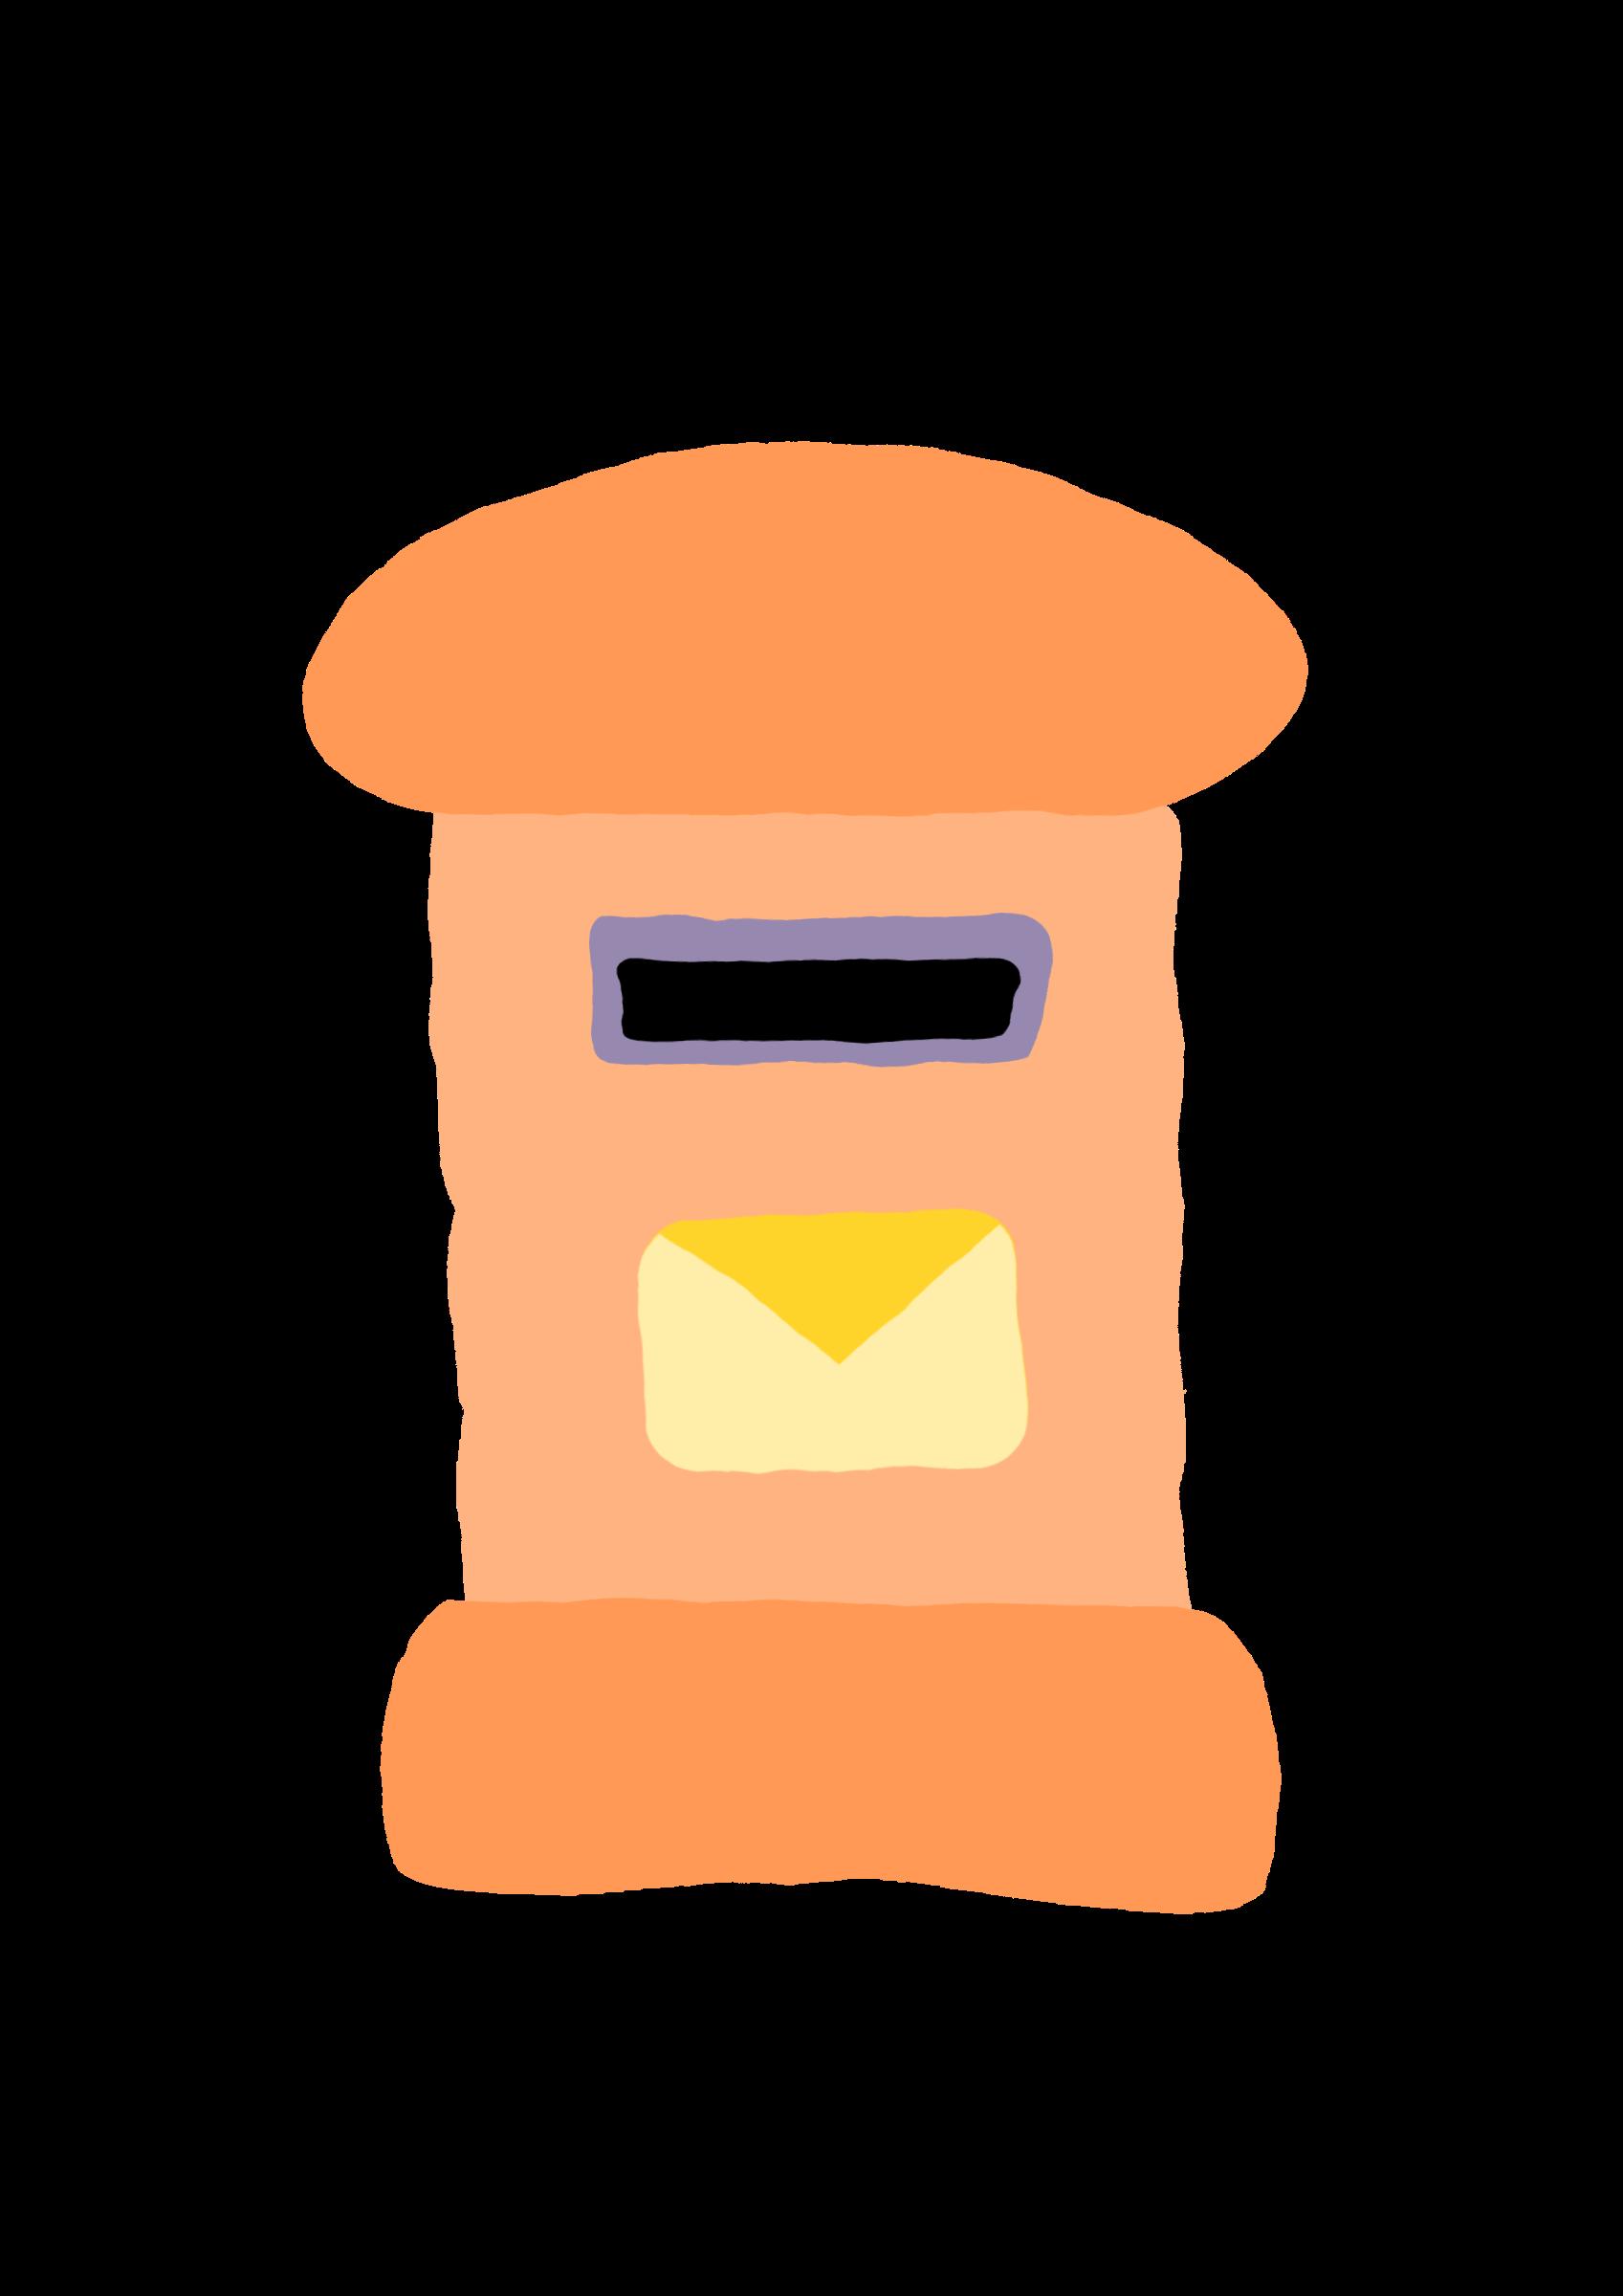 Mailbox clipart buzon. Crooked postal big image